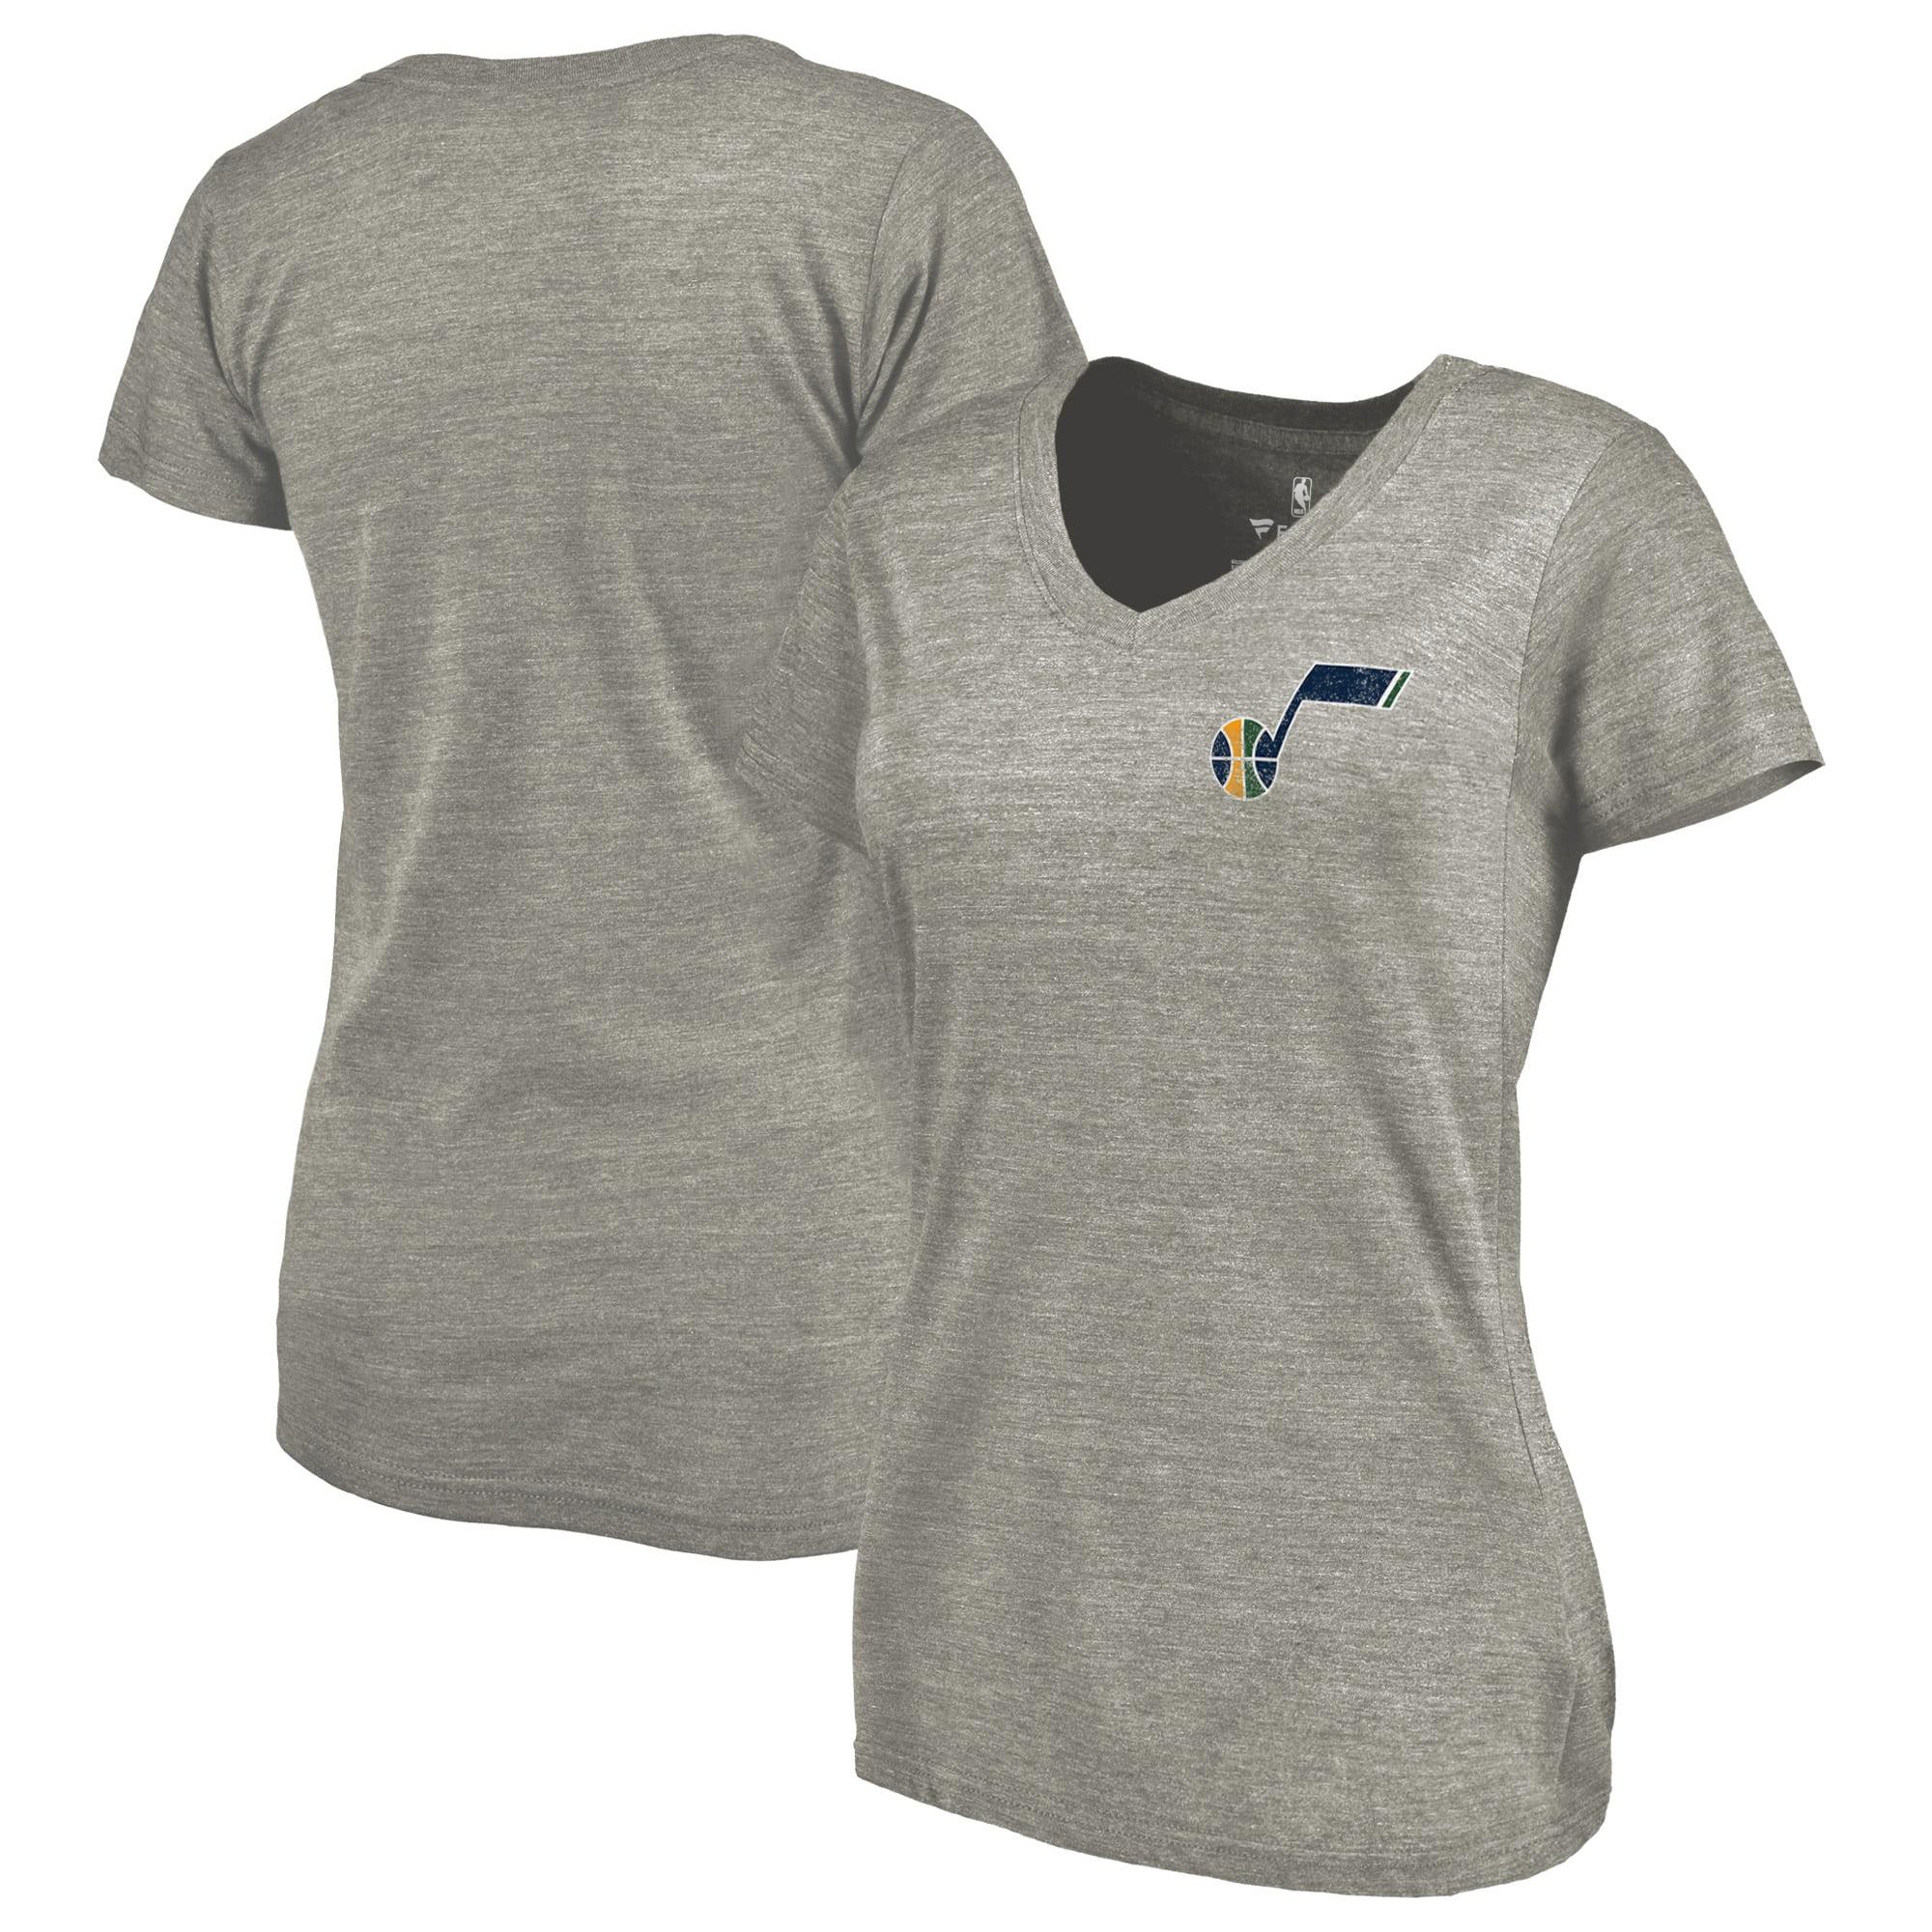 Utah Jazz Fanatics Branded Women's Primary Logo Left Chest Distressed Tri-Blend V-Neck T-Shirt - Heathered Gray